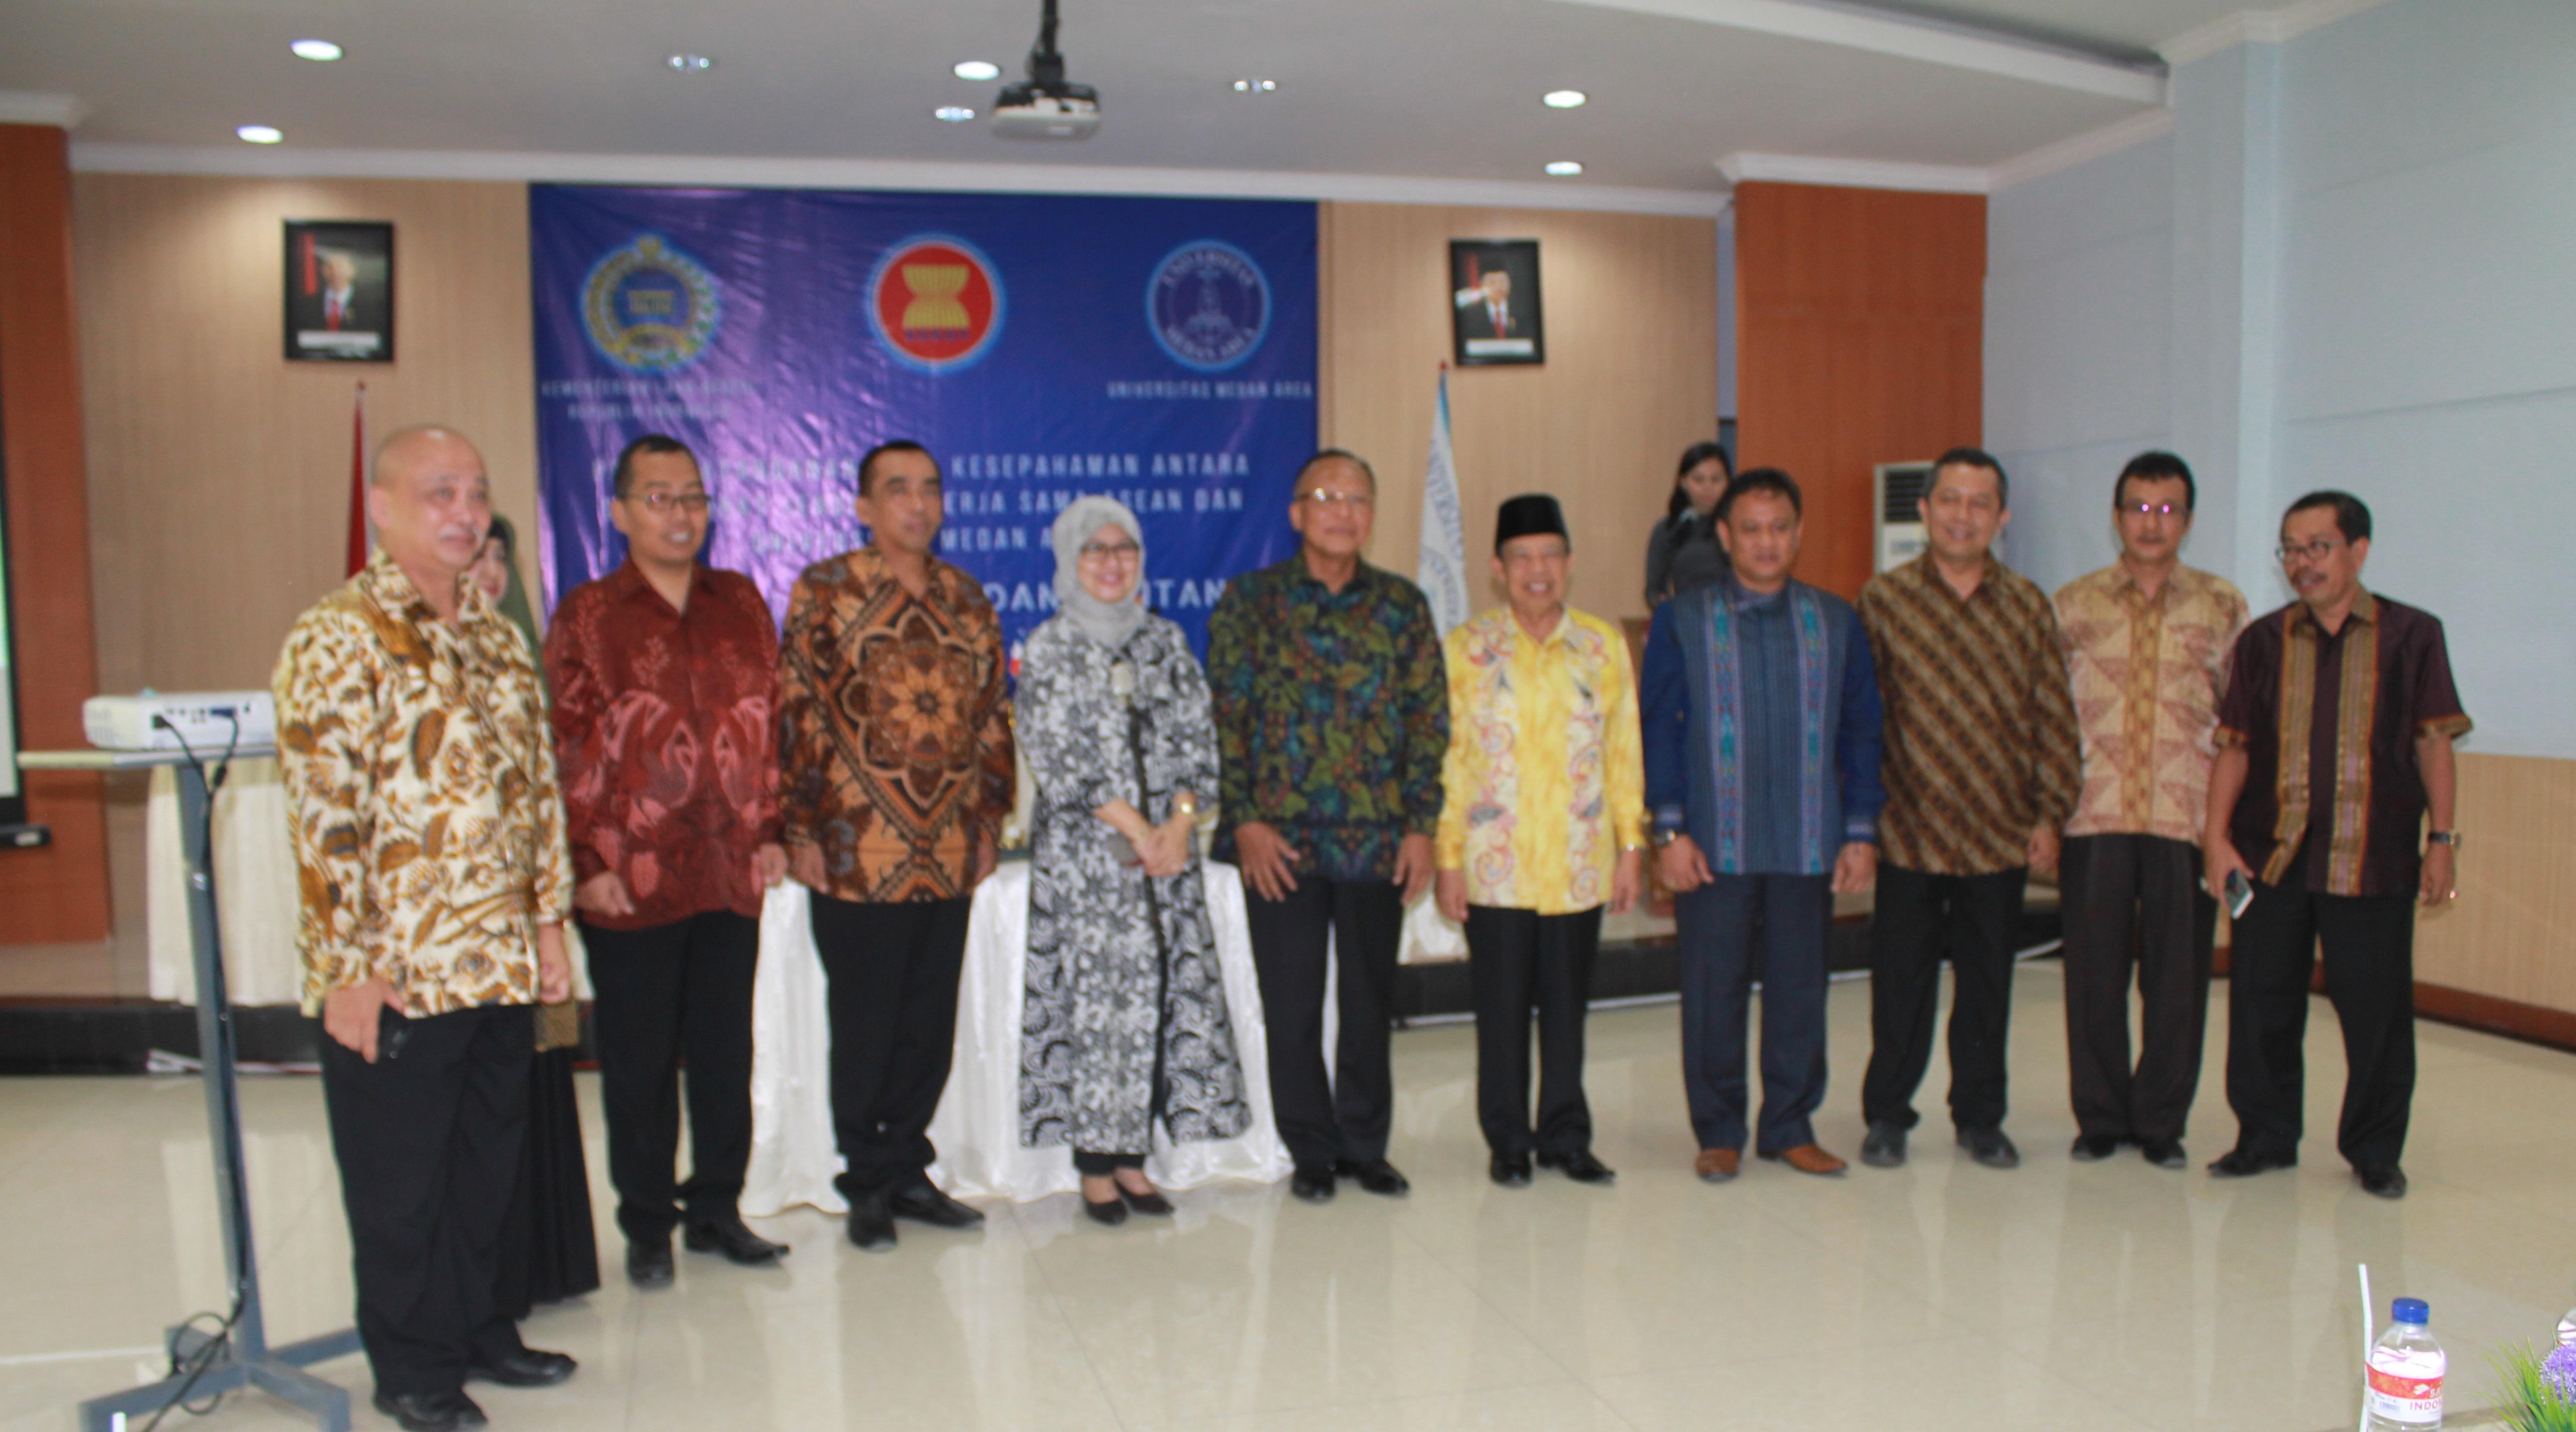 Pusat Studi ASEAN Universitas Medan Fokus Pada UMKM